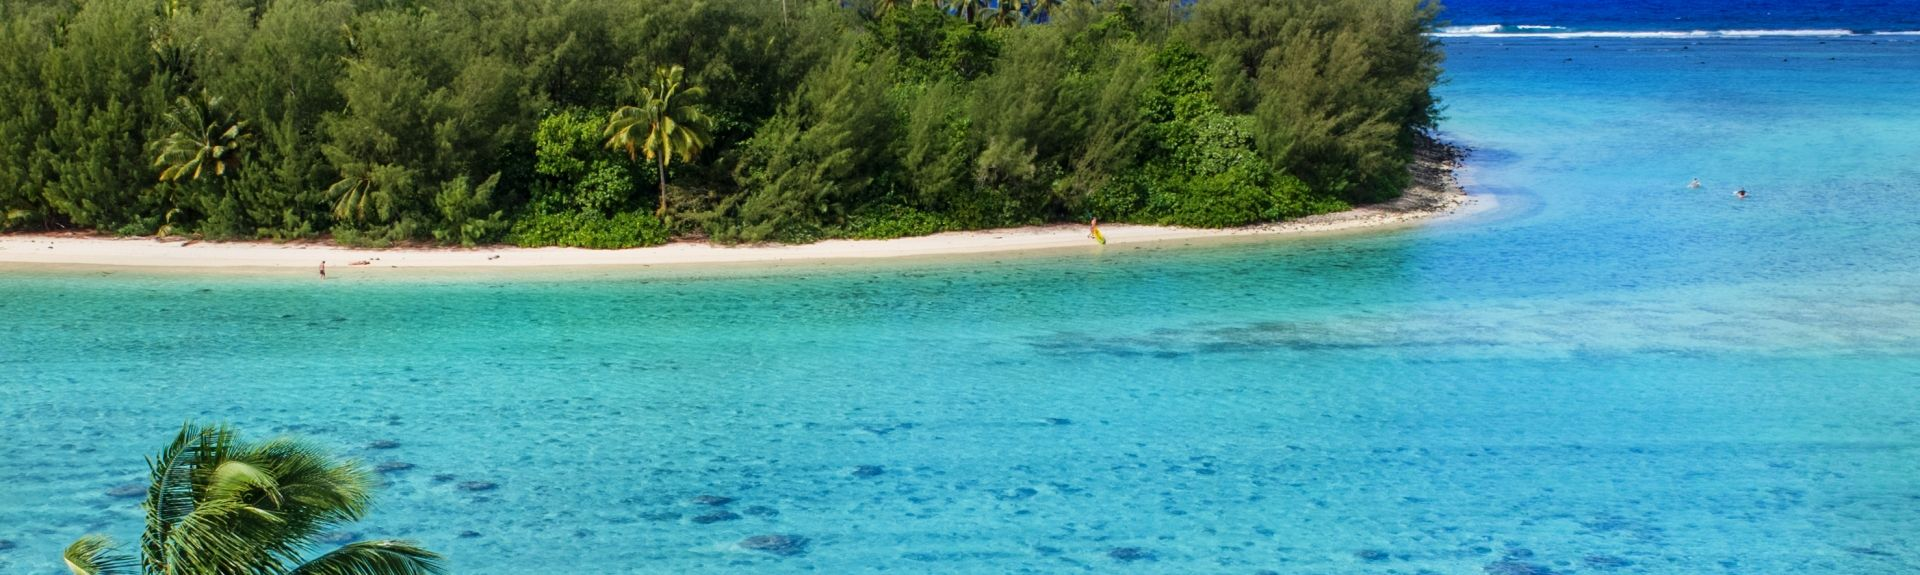 Matavera District, Cook Islands